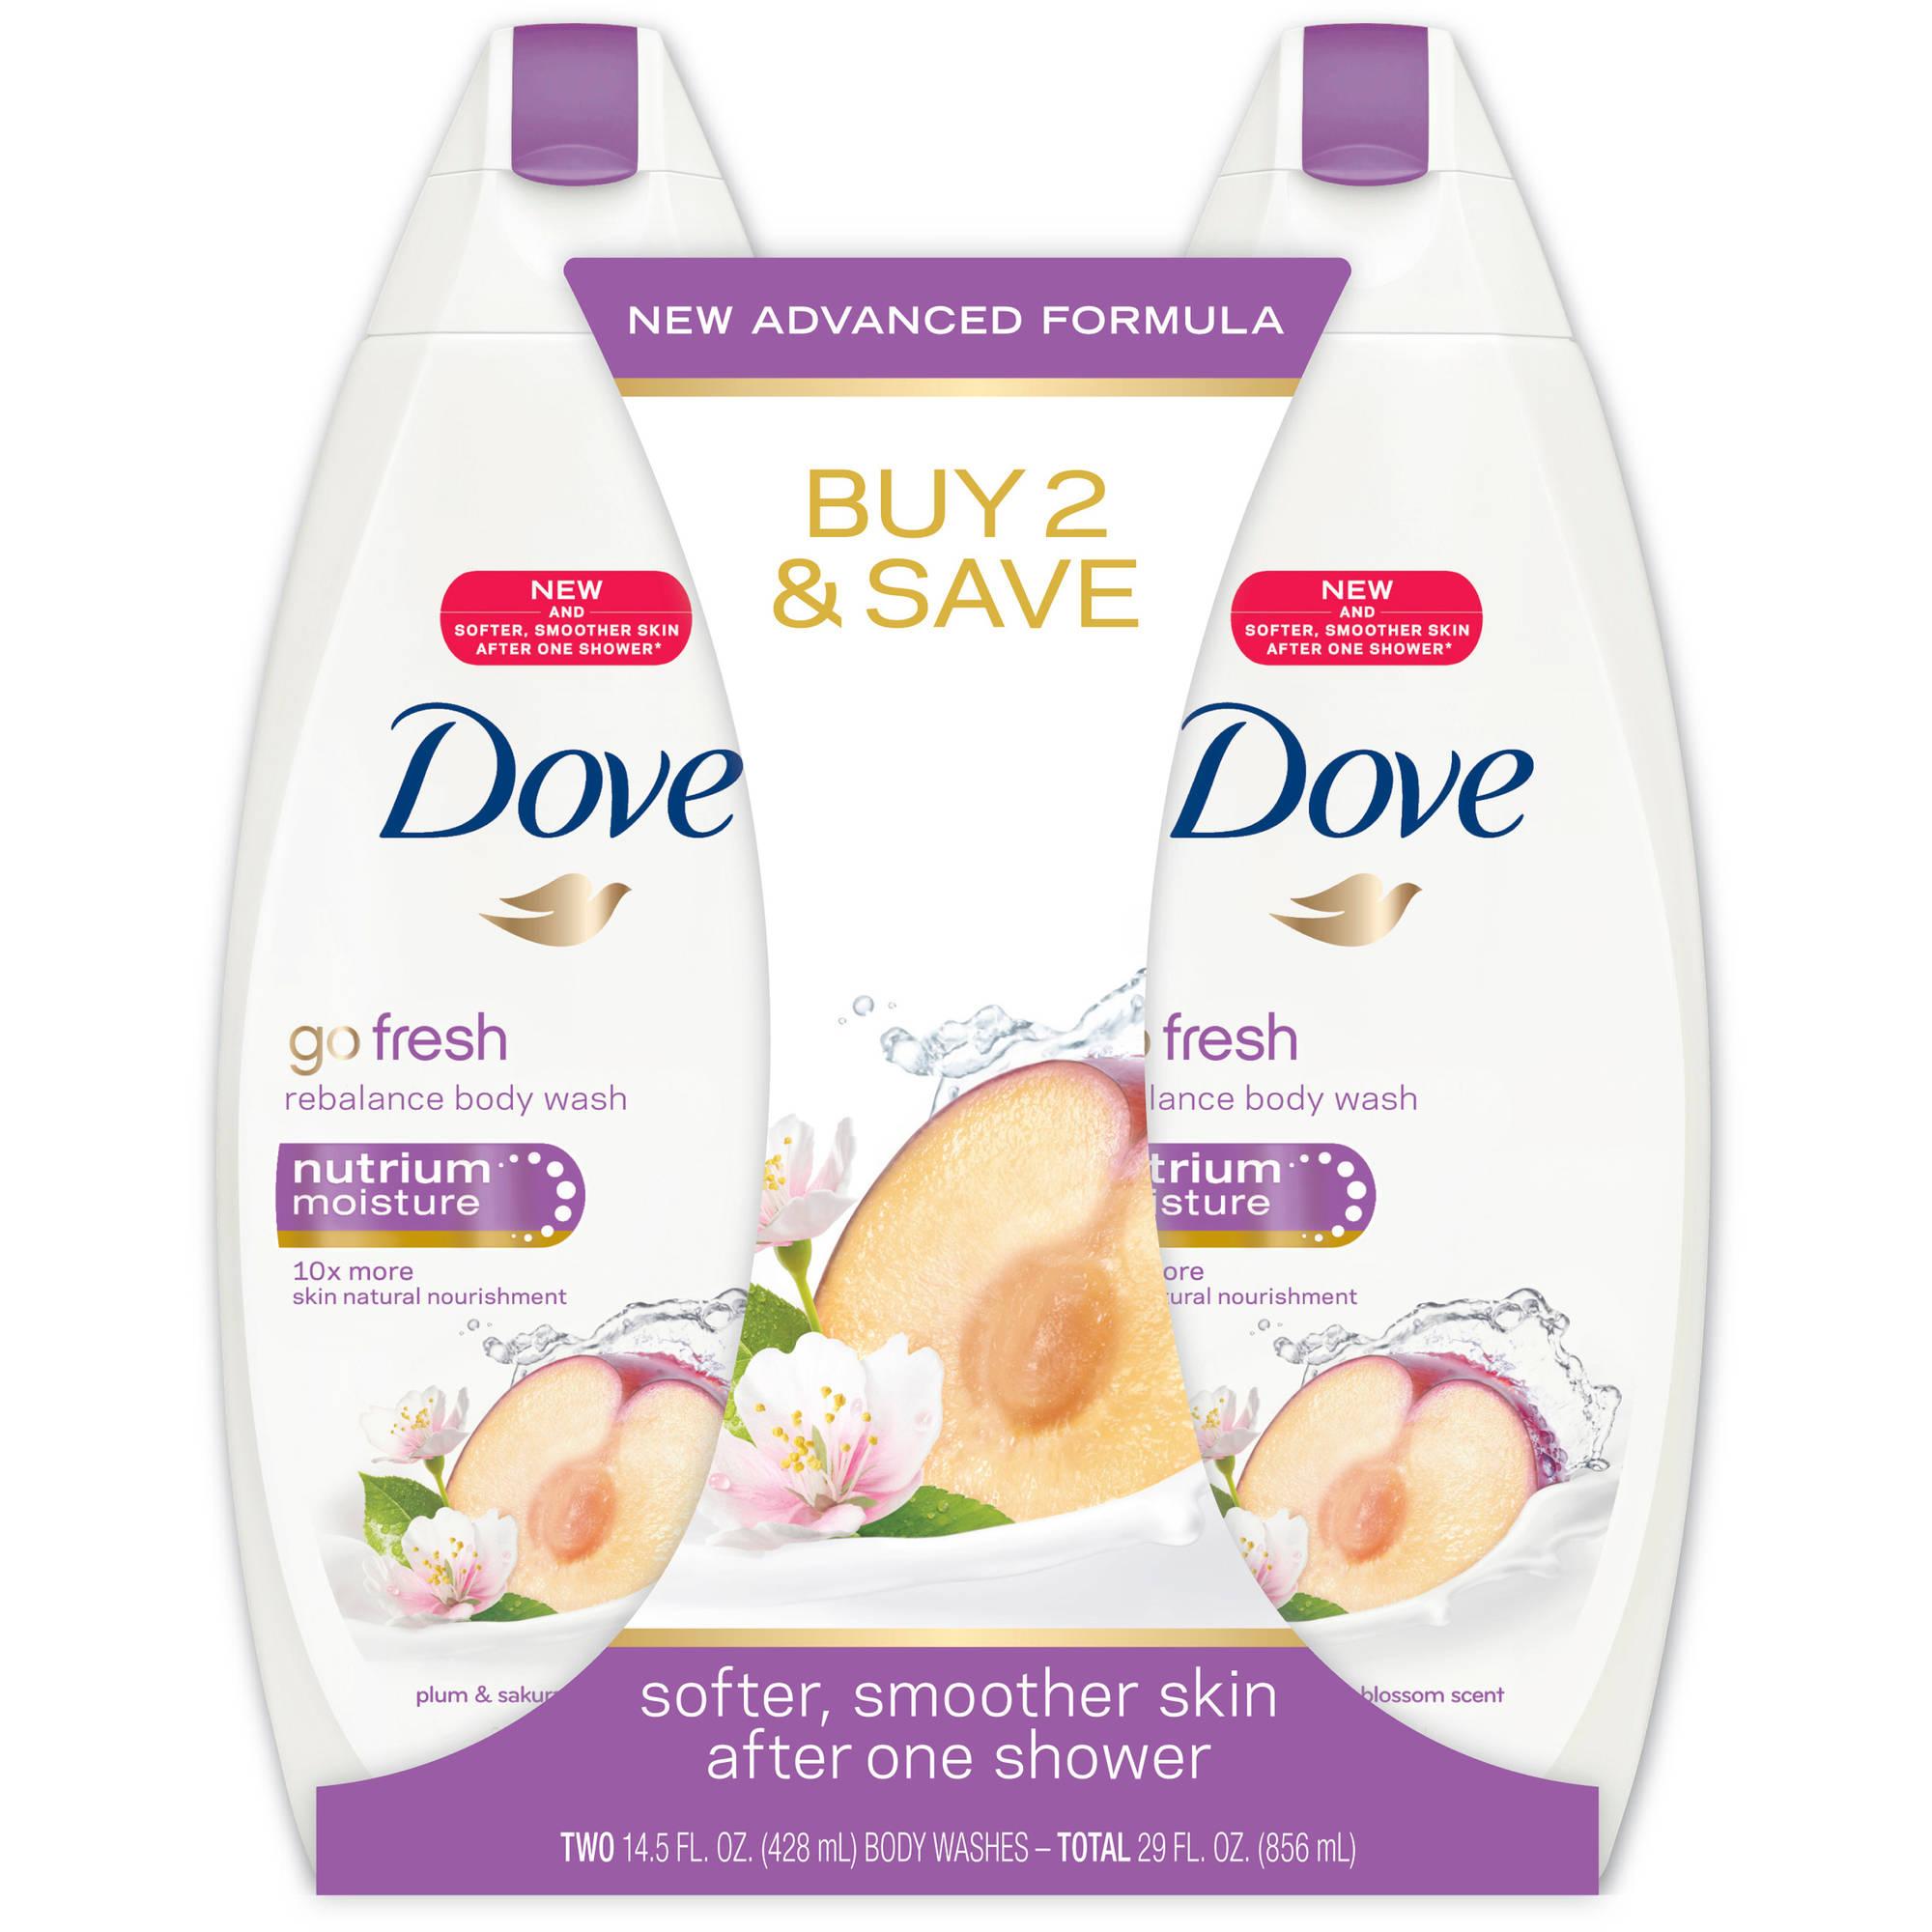 Dove go fresh Rebalance Body Wash, 14.5 oz, Twin Pack